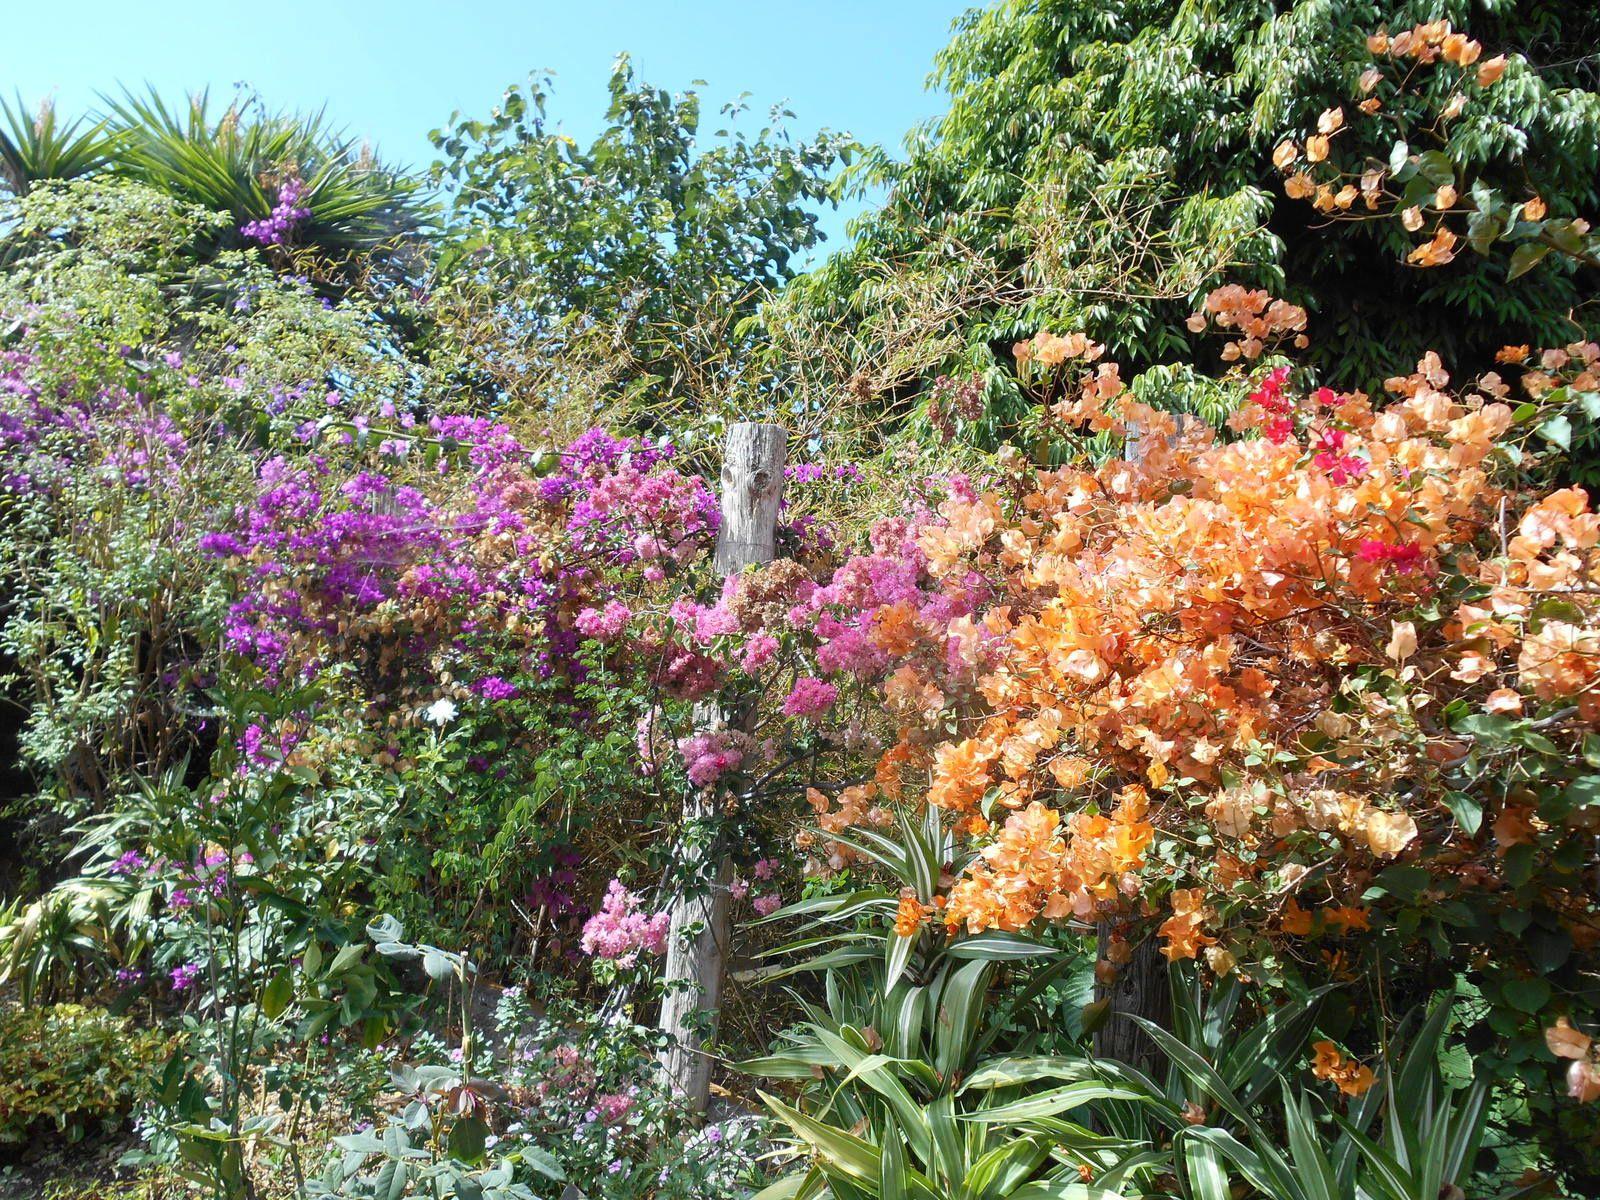 Les jardins de Puerto de la Cruz. Île de Ténérife